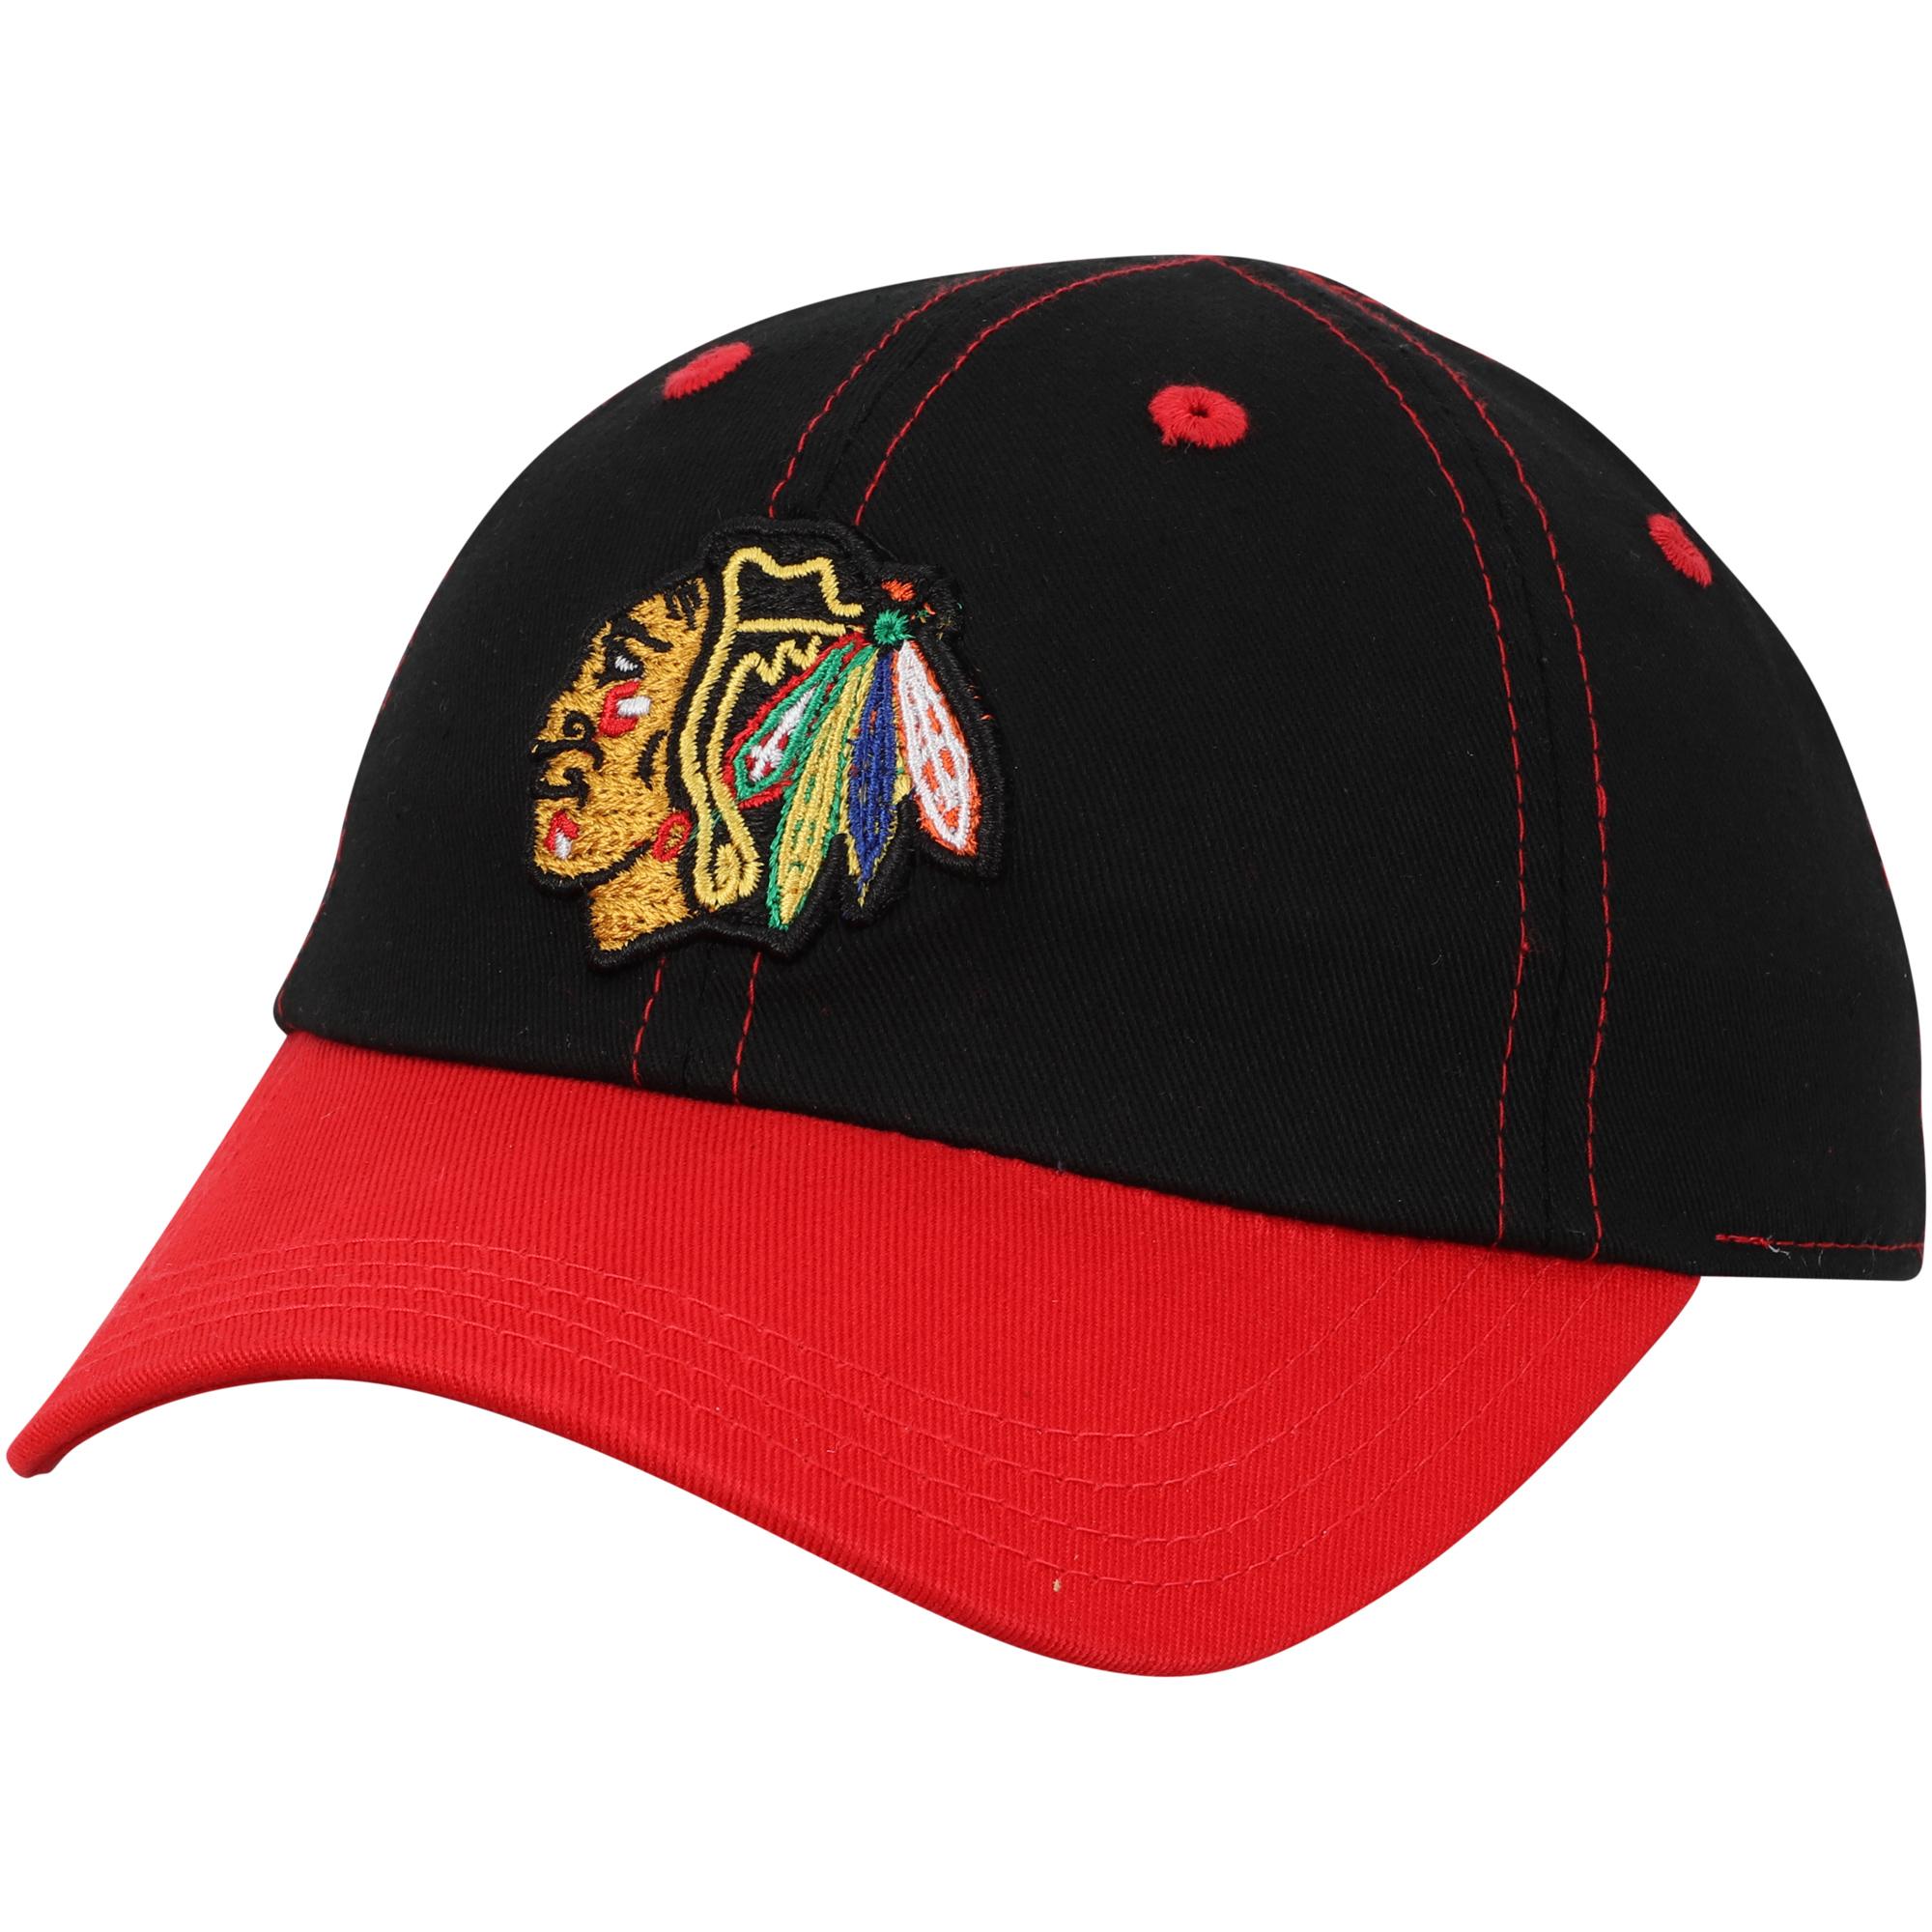 Chicago Blackhawks Infant Chainstitch Slouch Adjustable Hat - Black/Red - OSFA